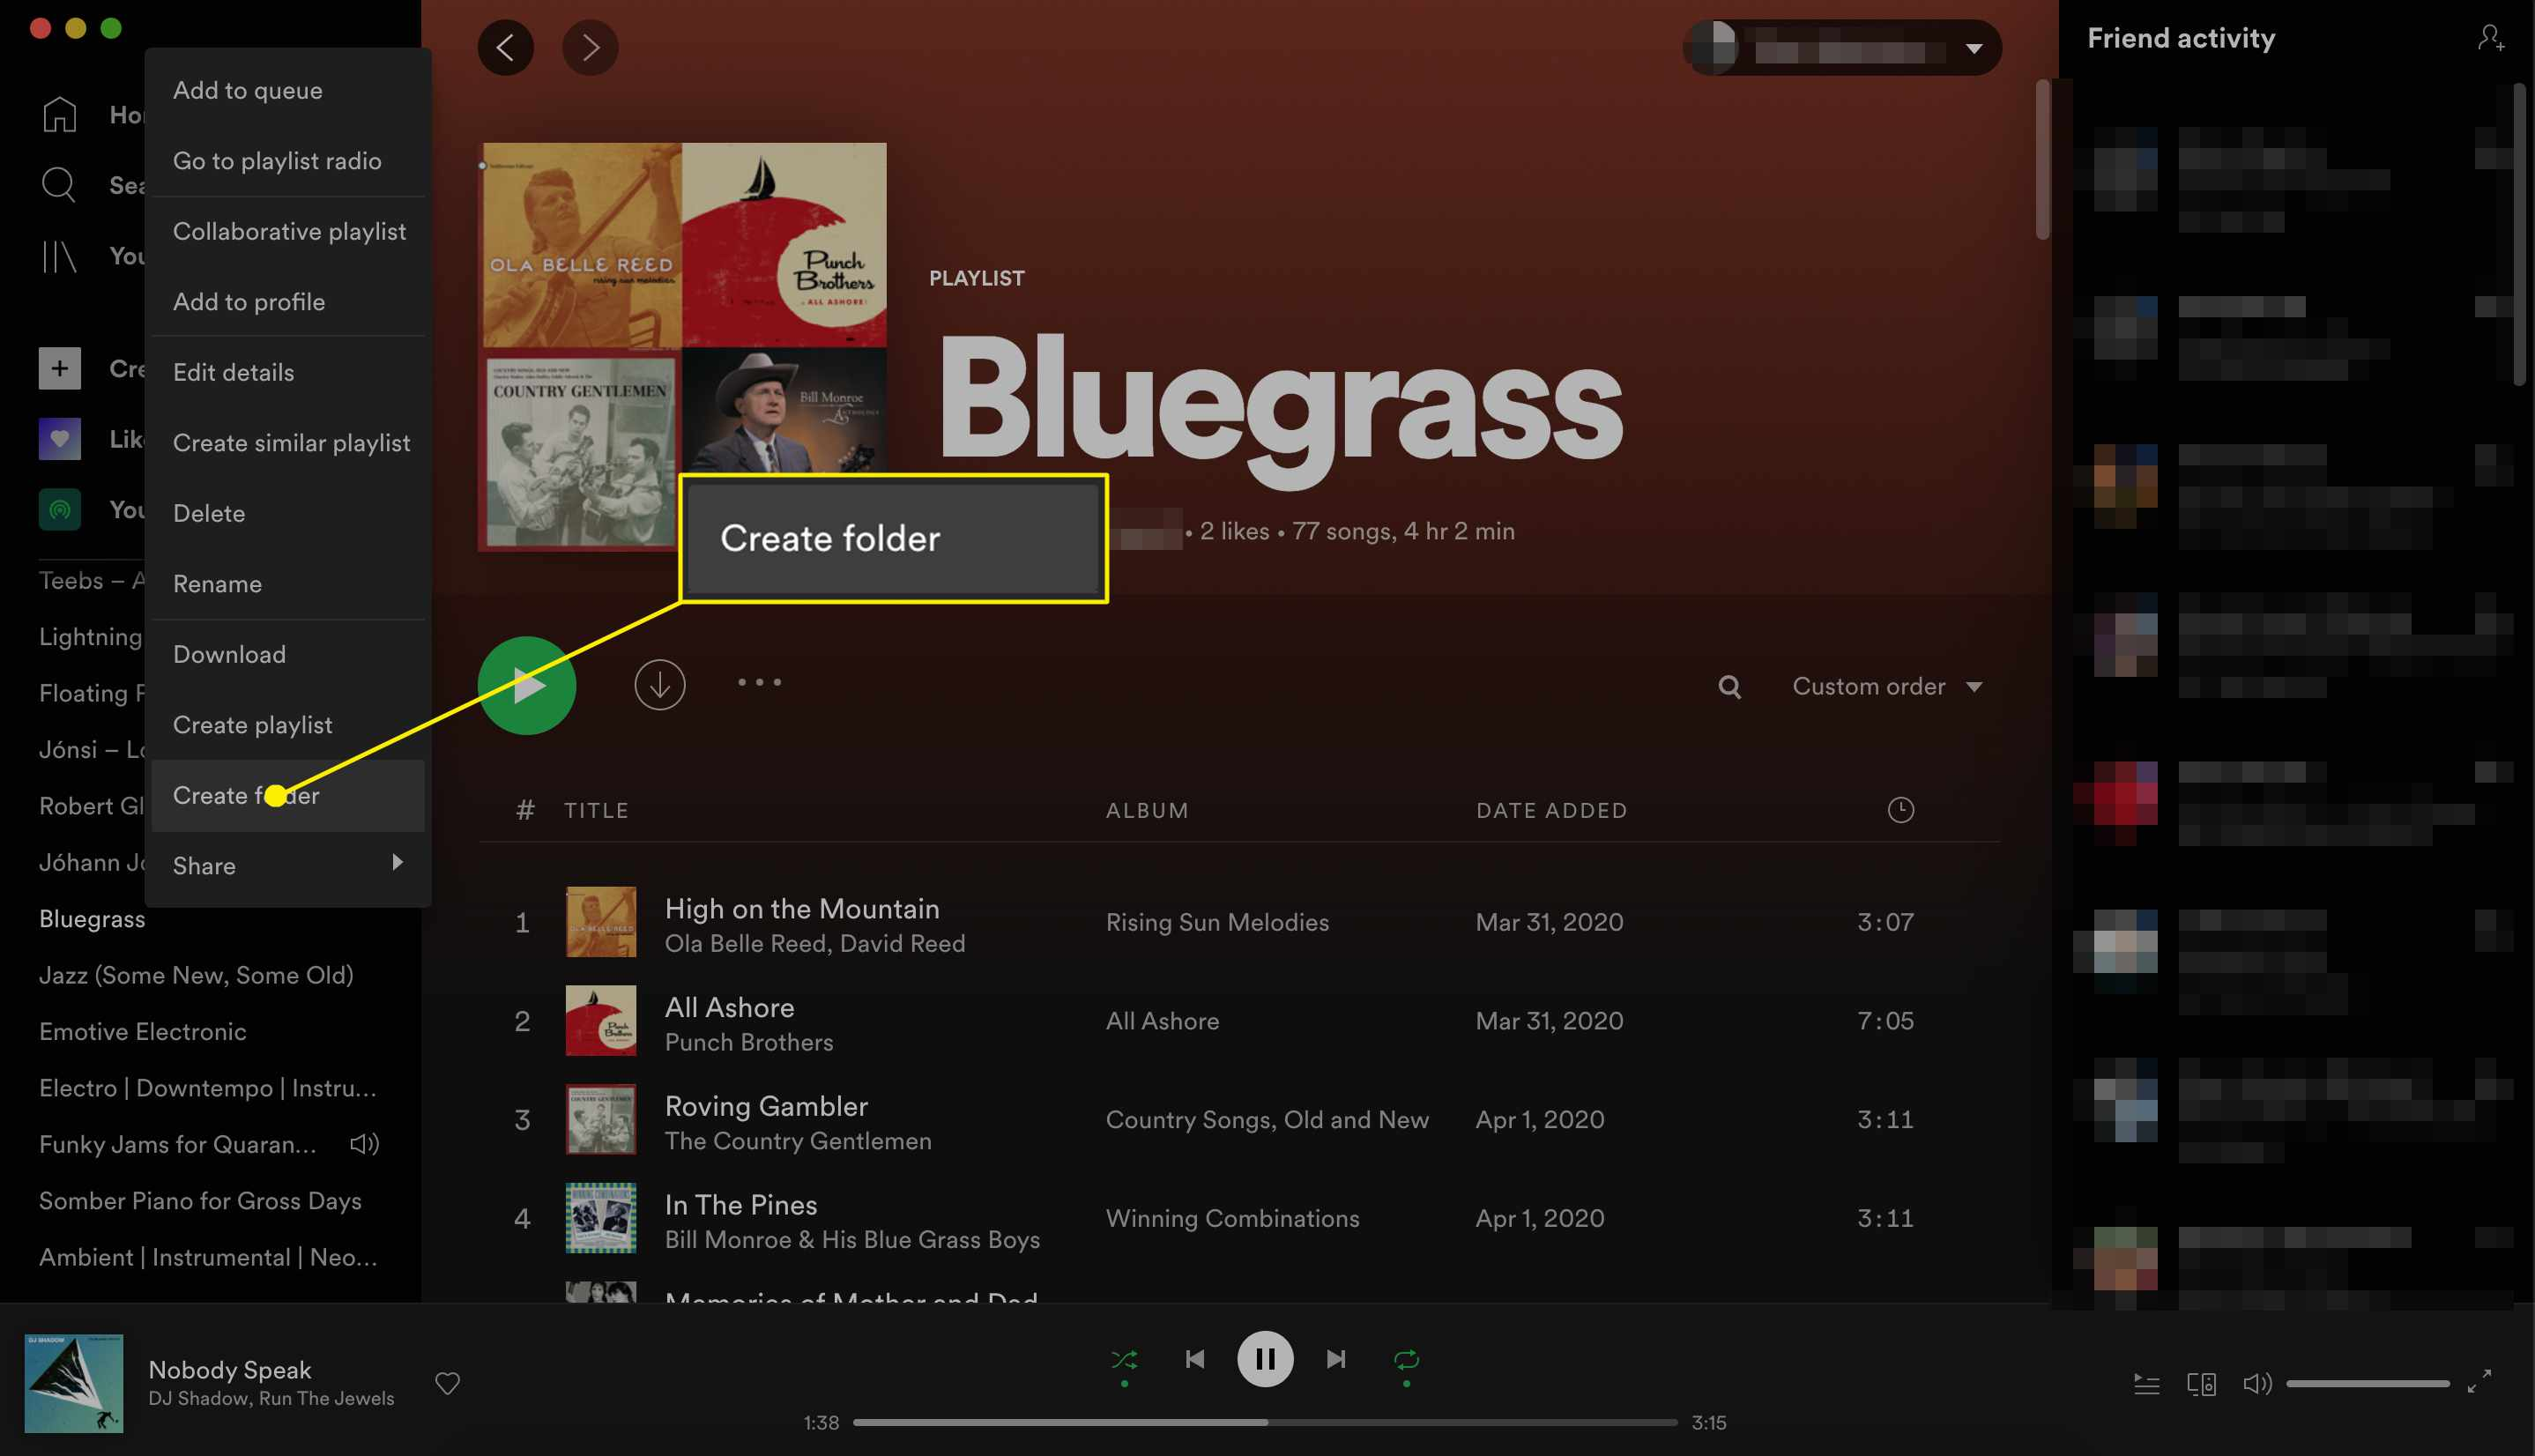 Spotify playlist create folder